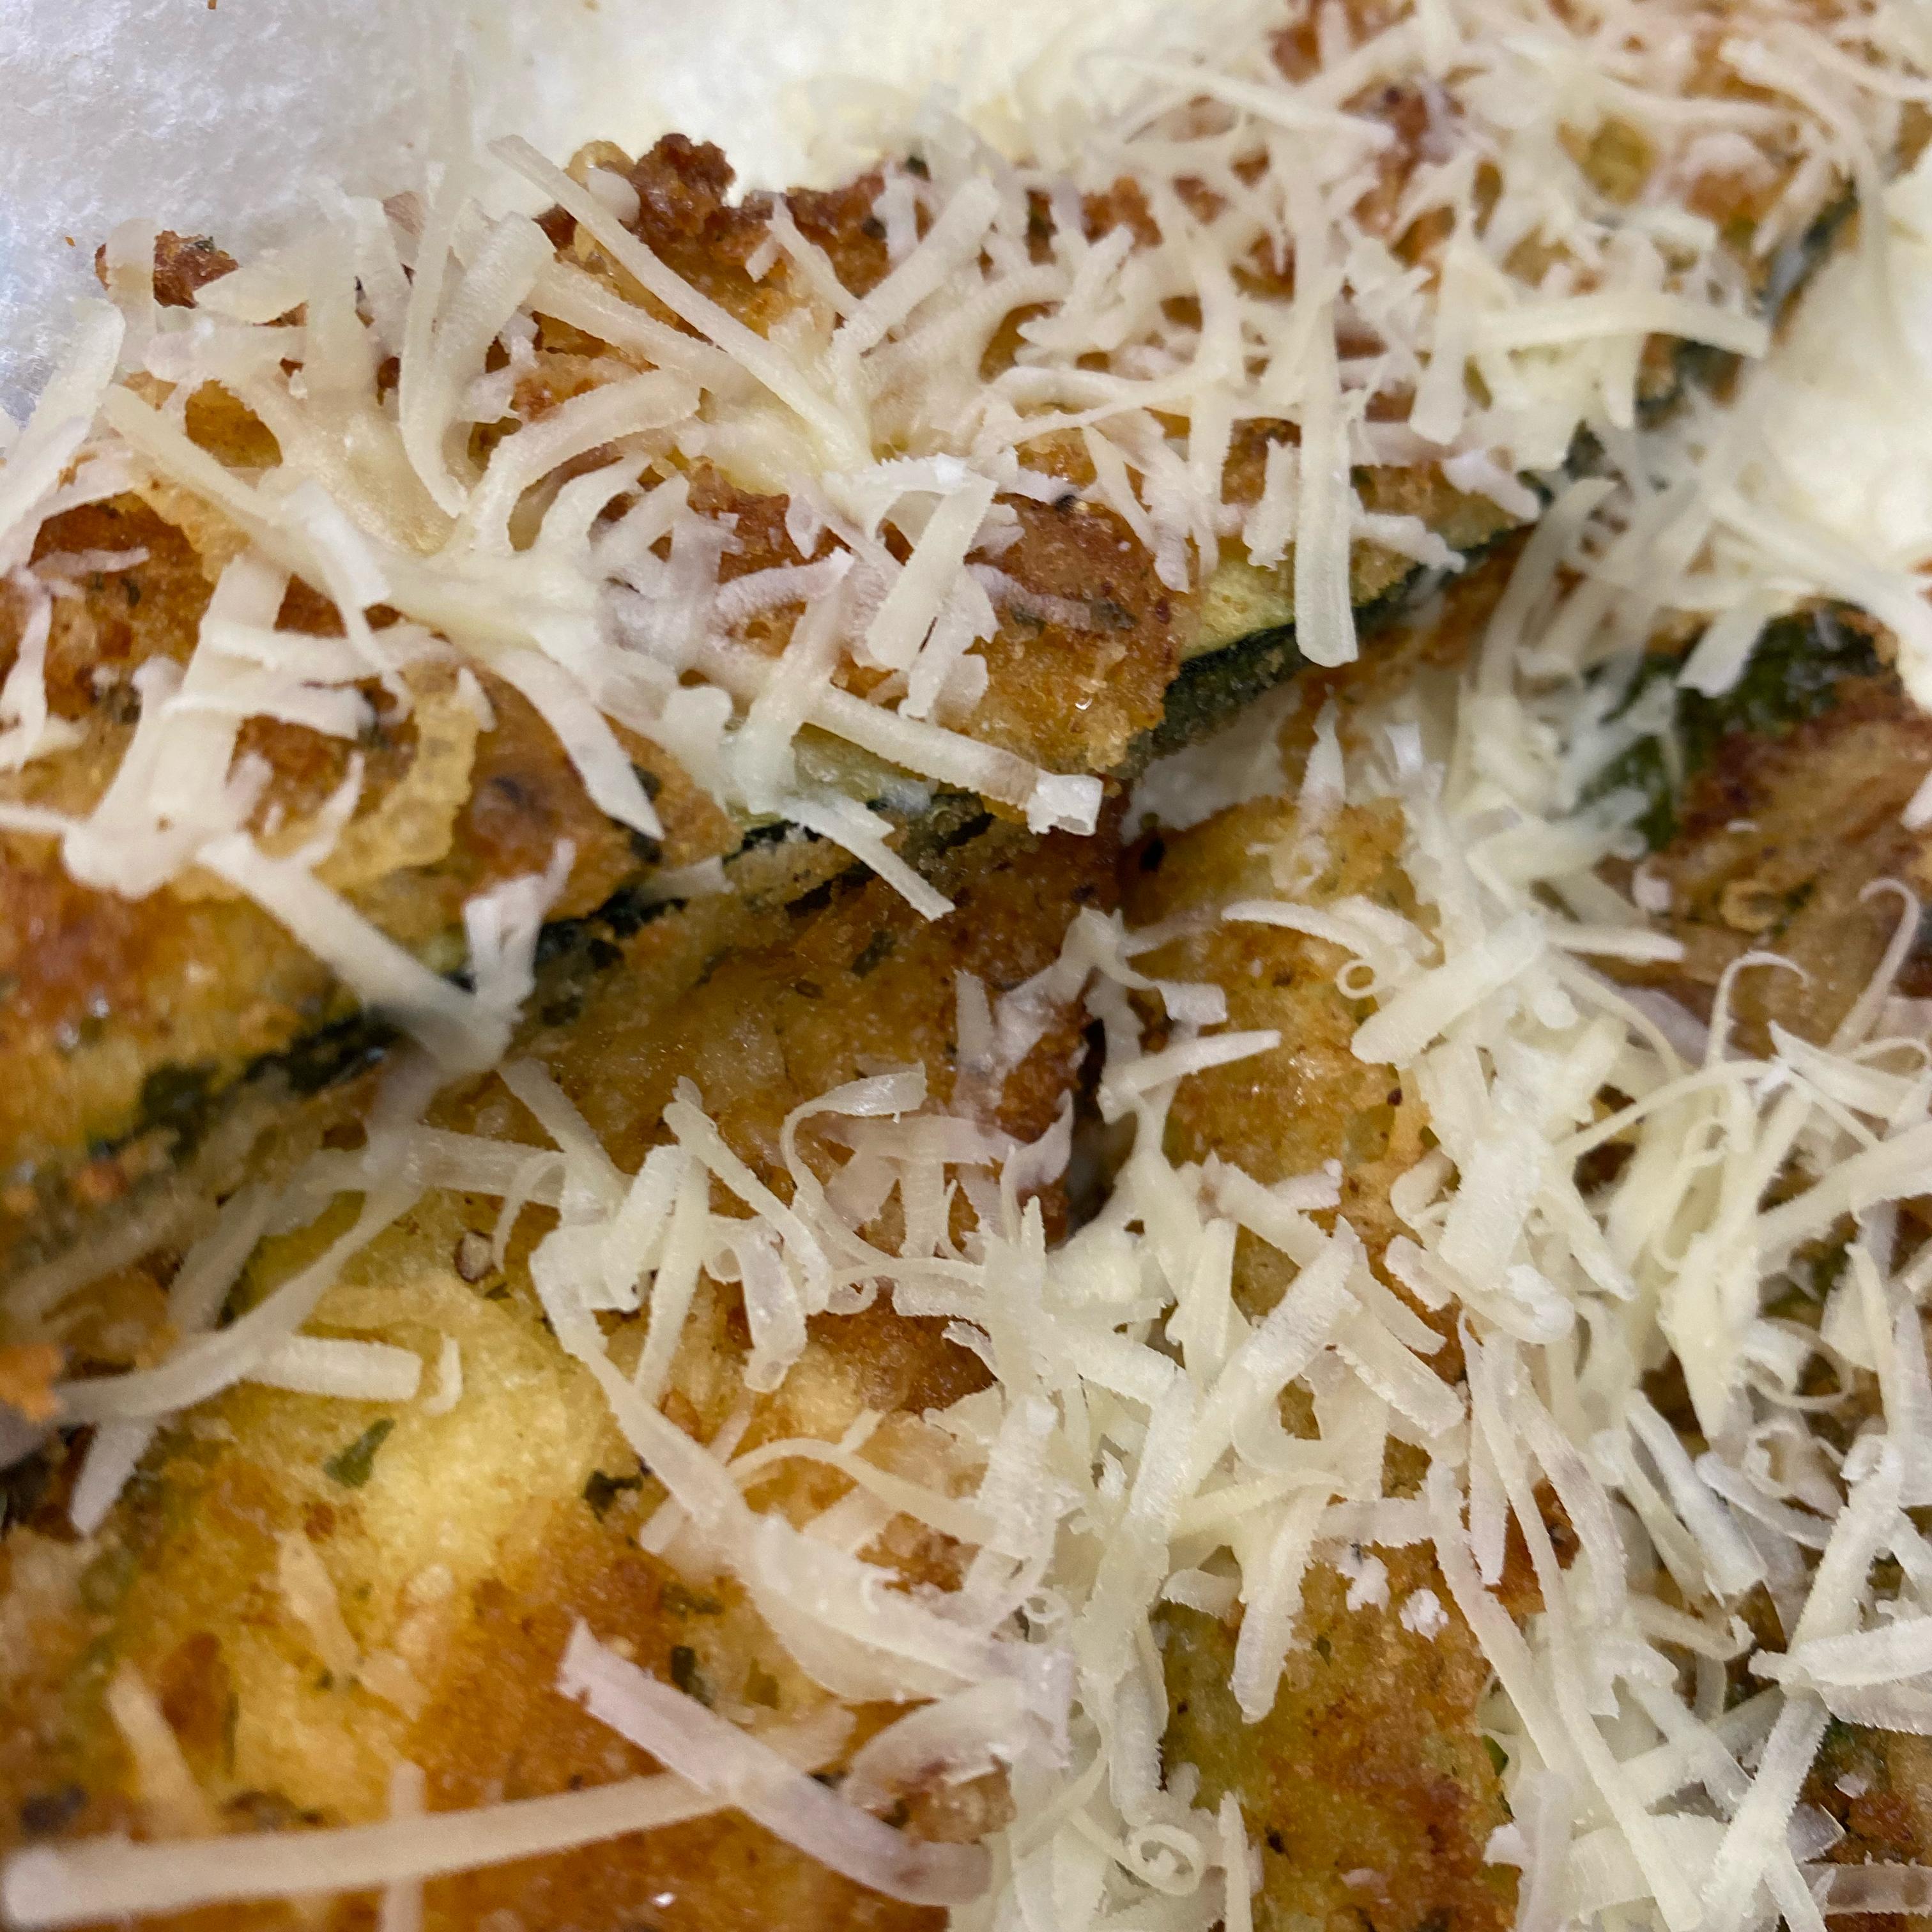 Parmesan Fried Zucchini metalbabe06